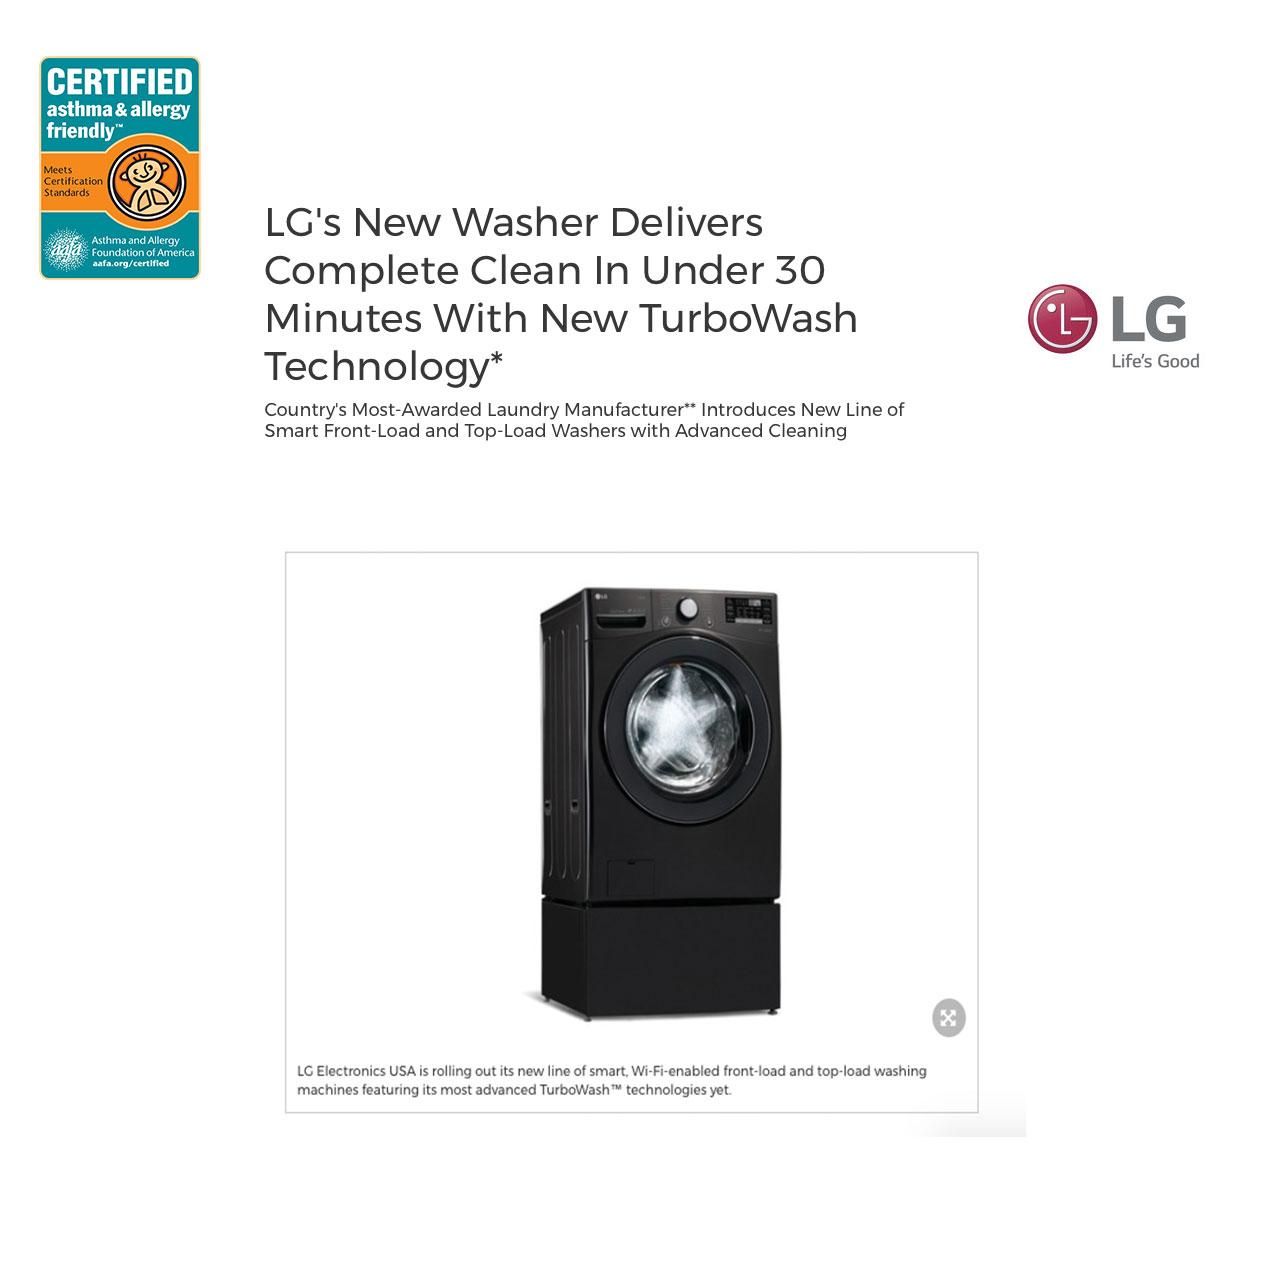 LG-New-washing-machine-certified-asthma-allergy-friendly-allergy-standards